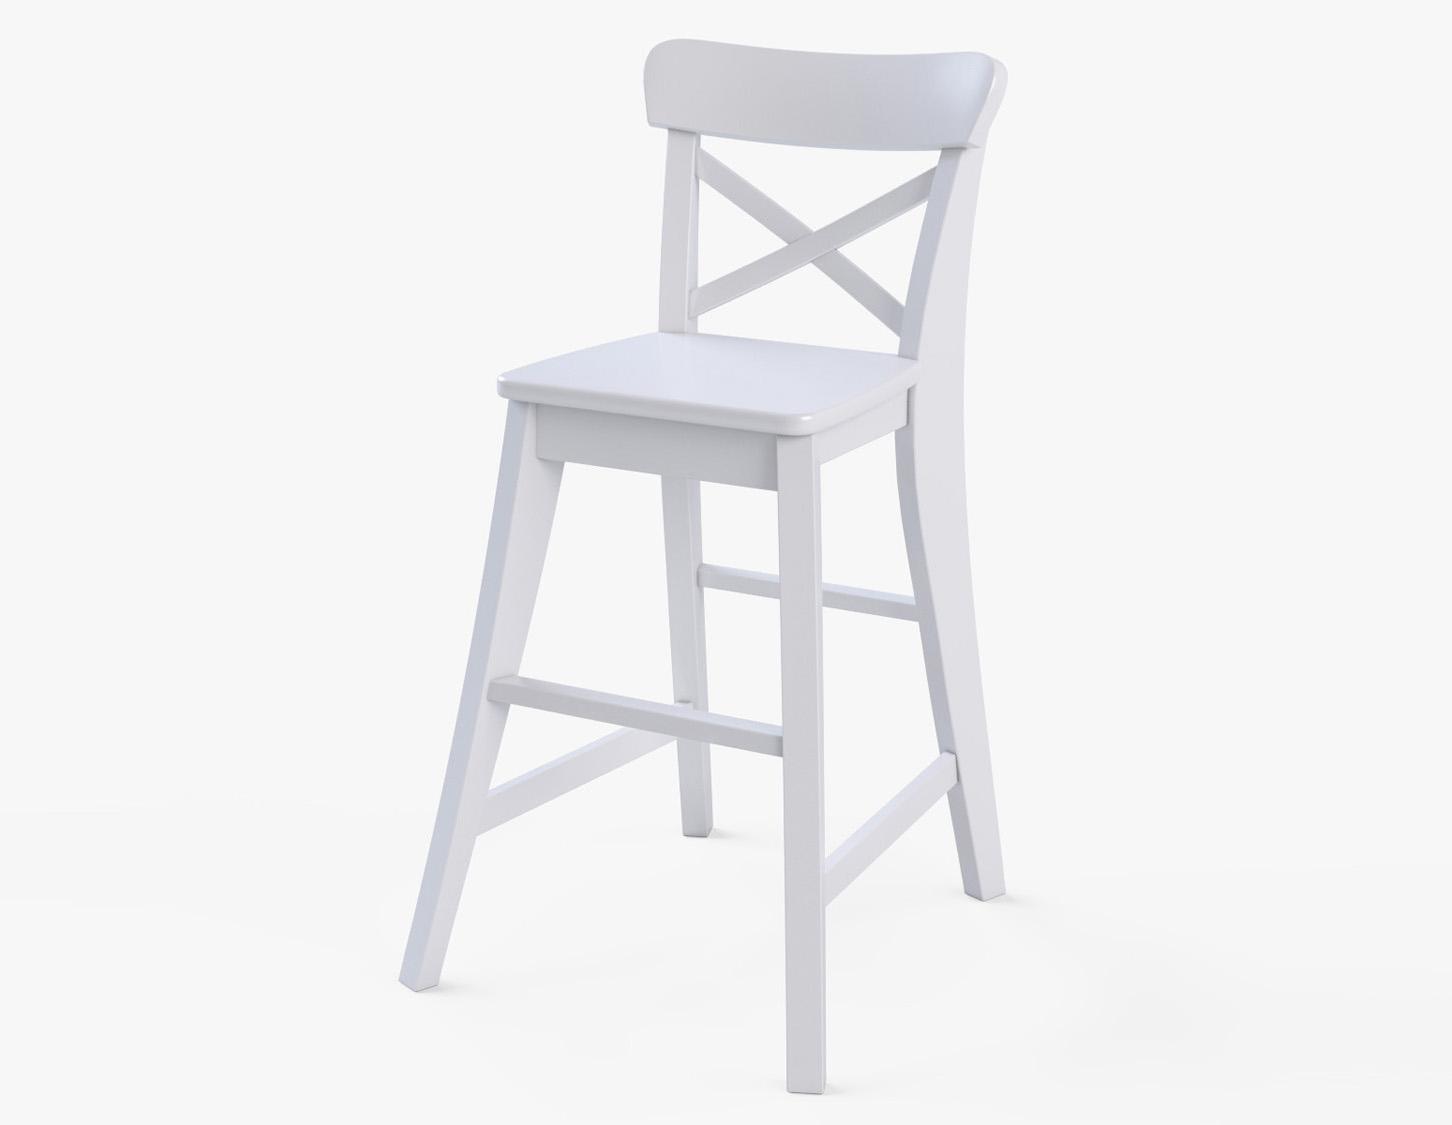 Junior Chair Ikea Ingolf White 3D Model